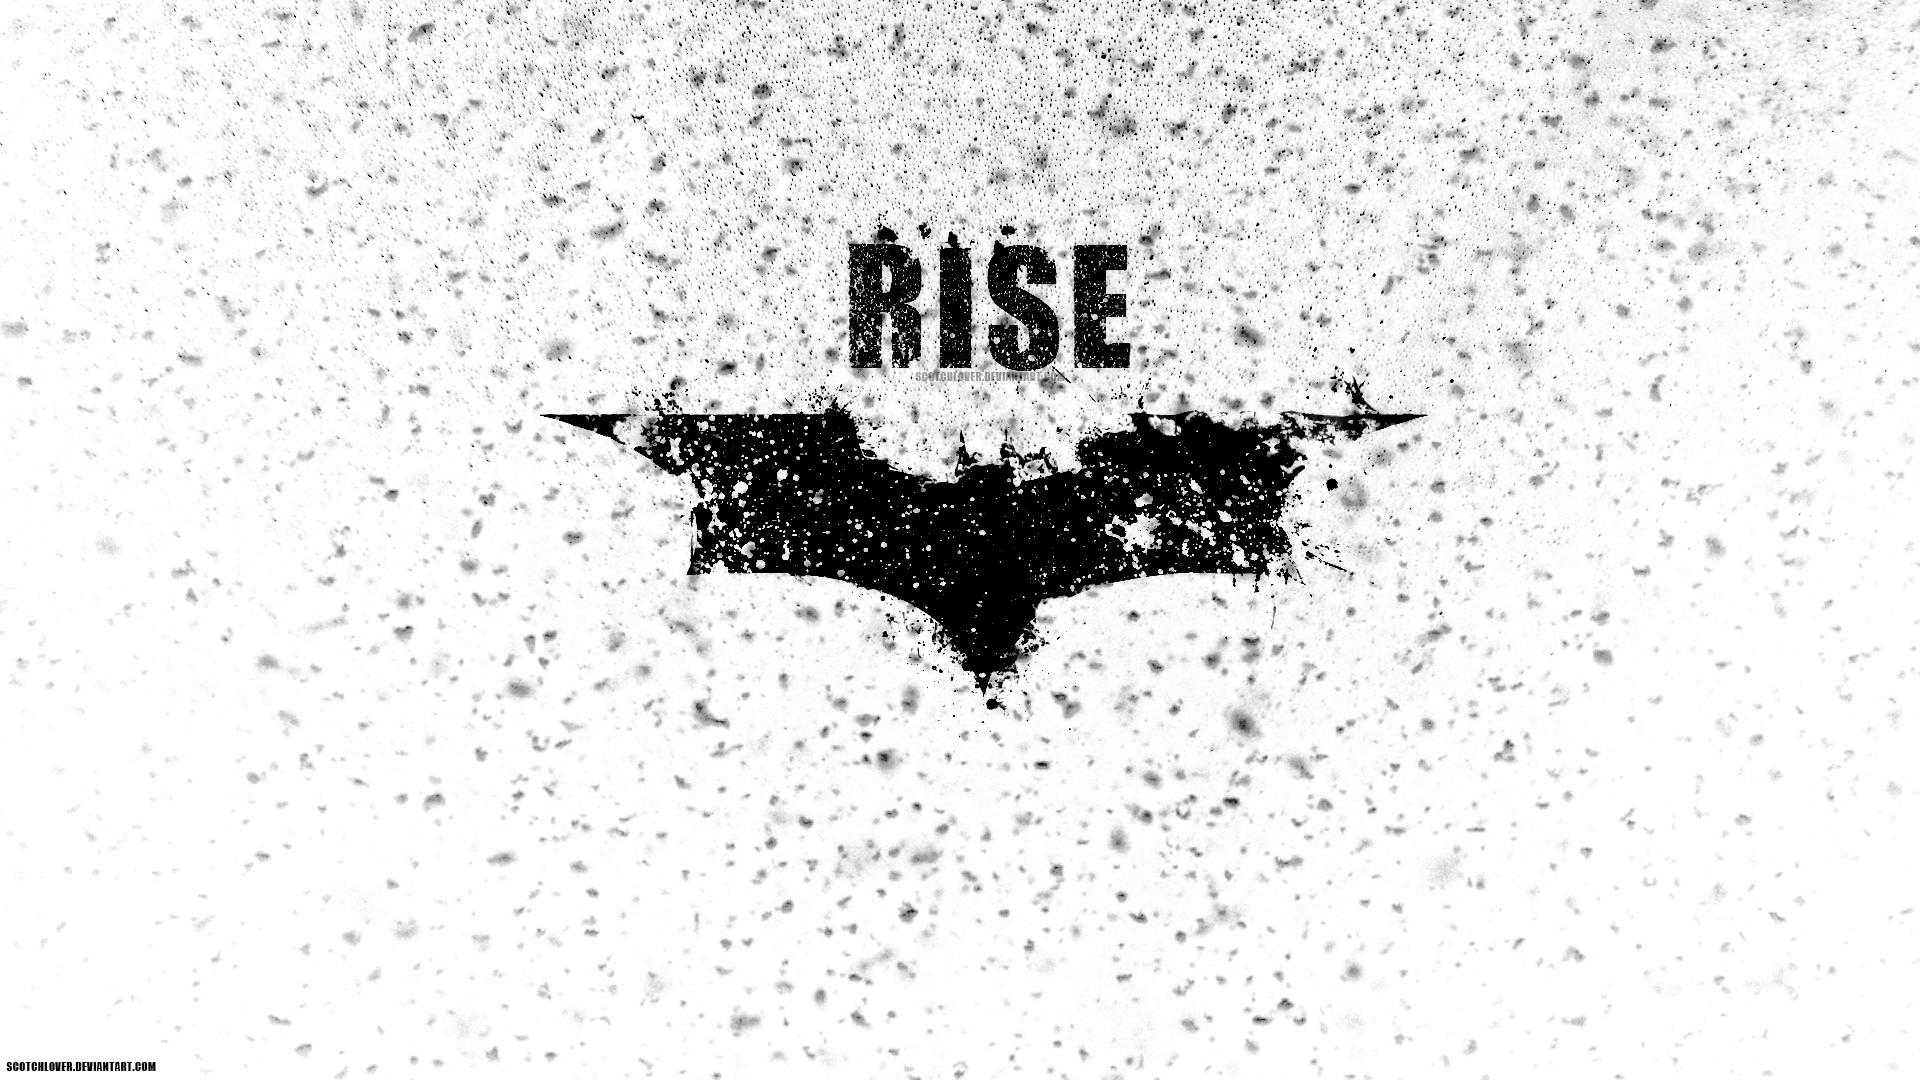 The Dark Knight Rises Shooting Satanic Influence of The